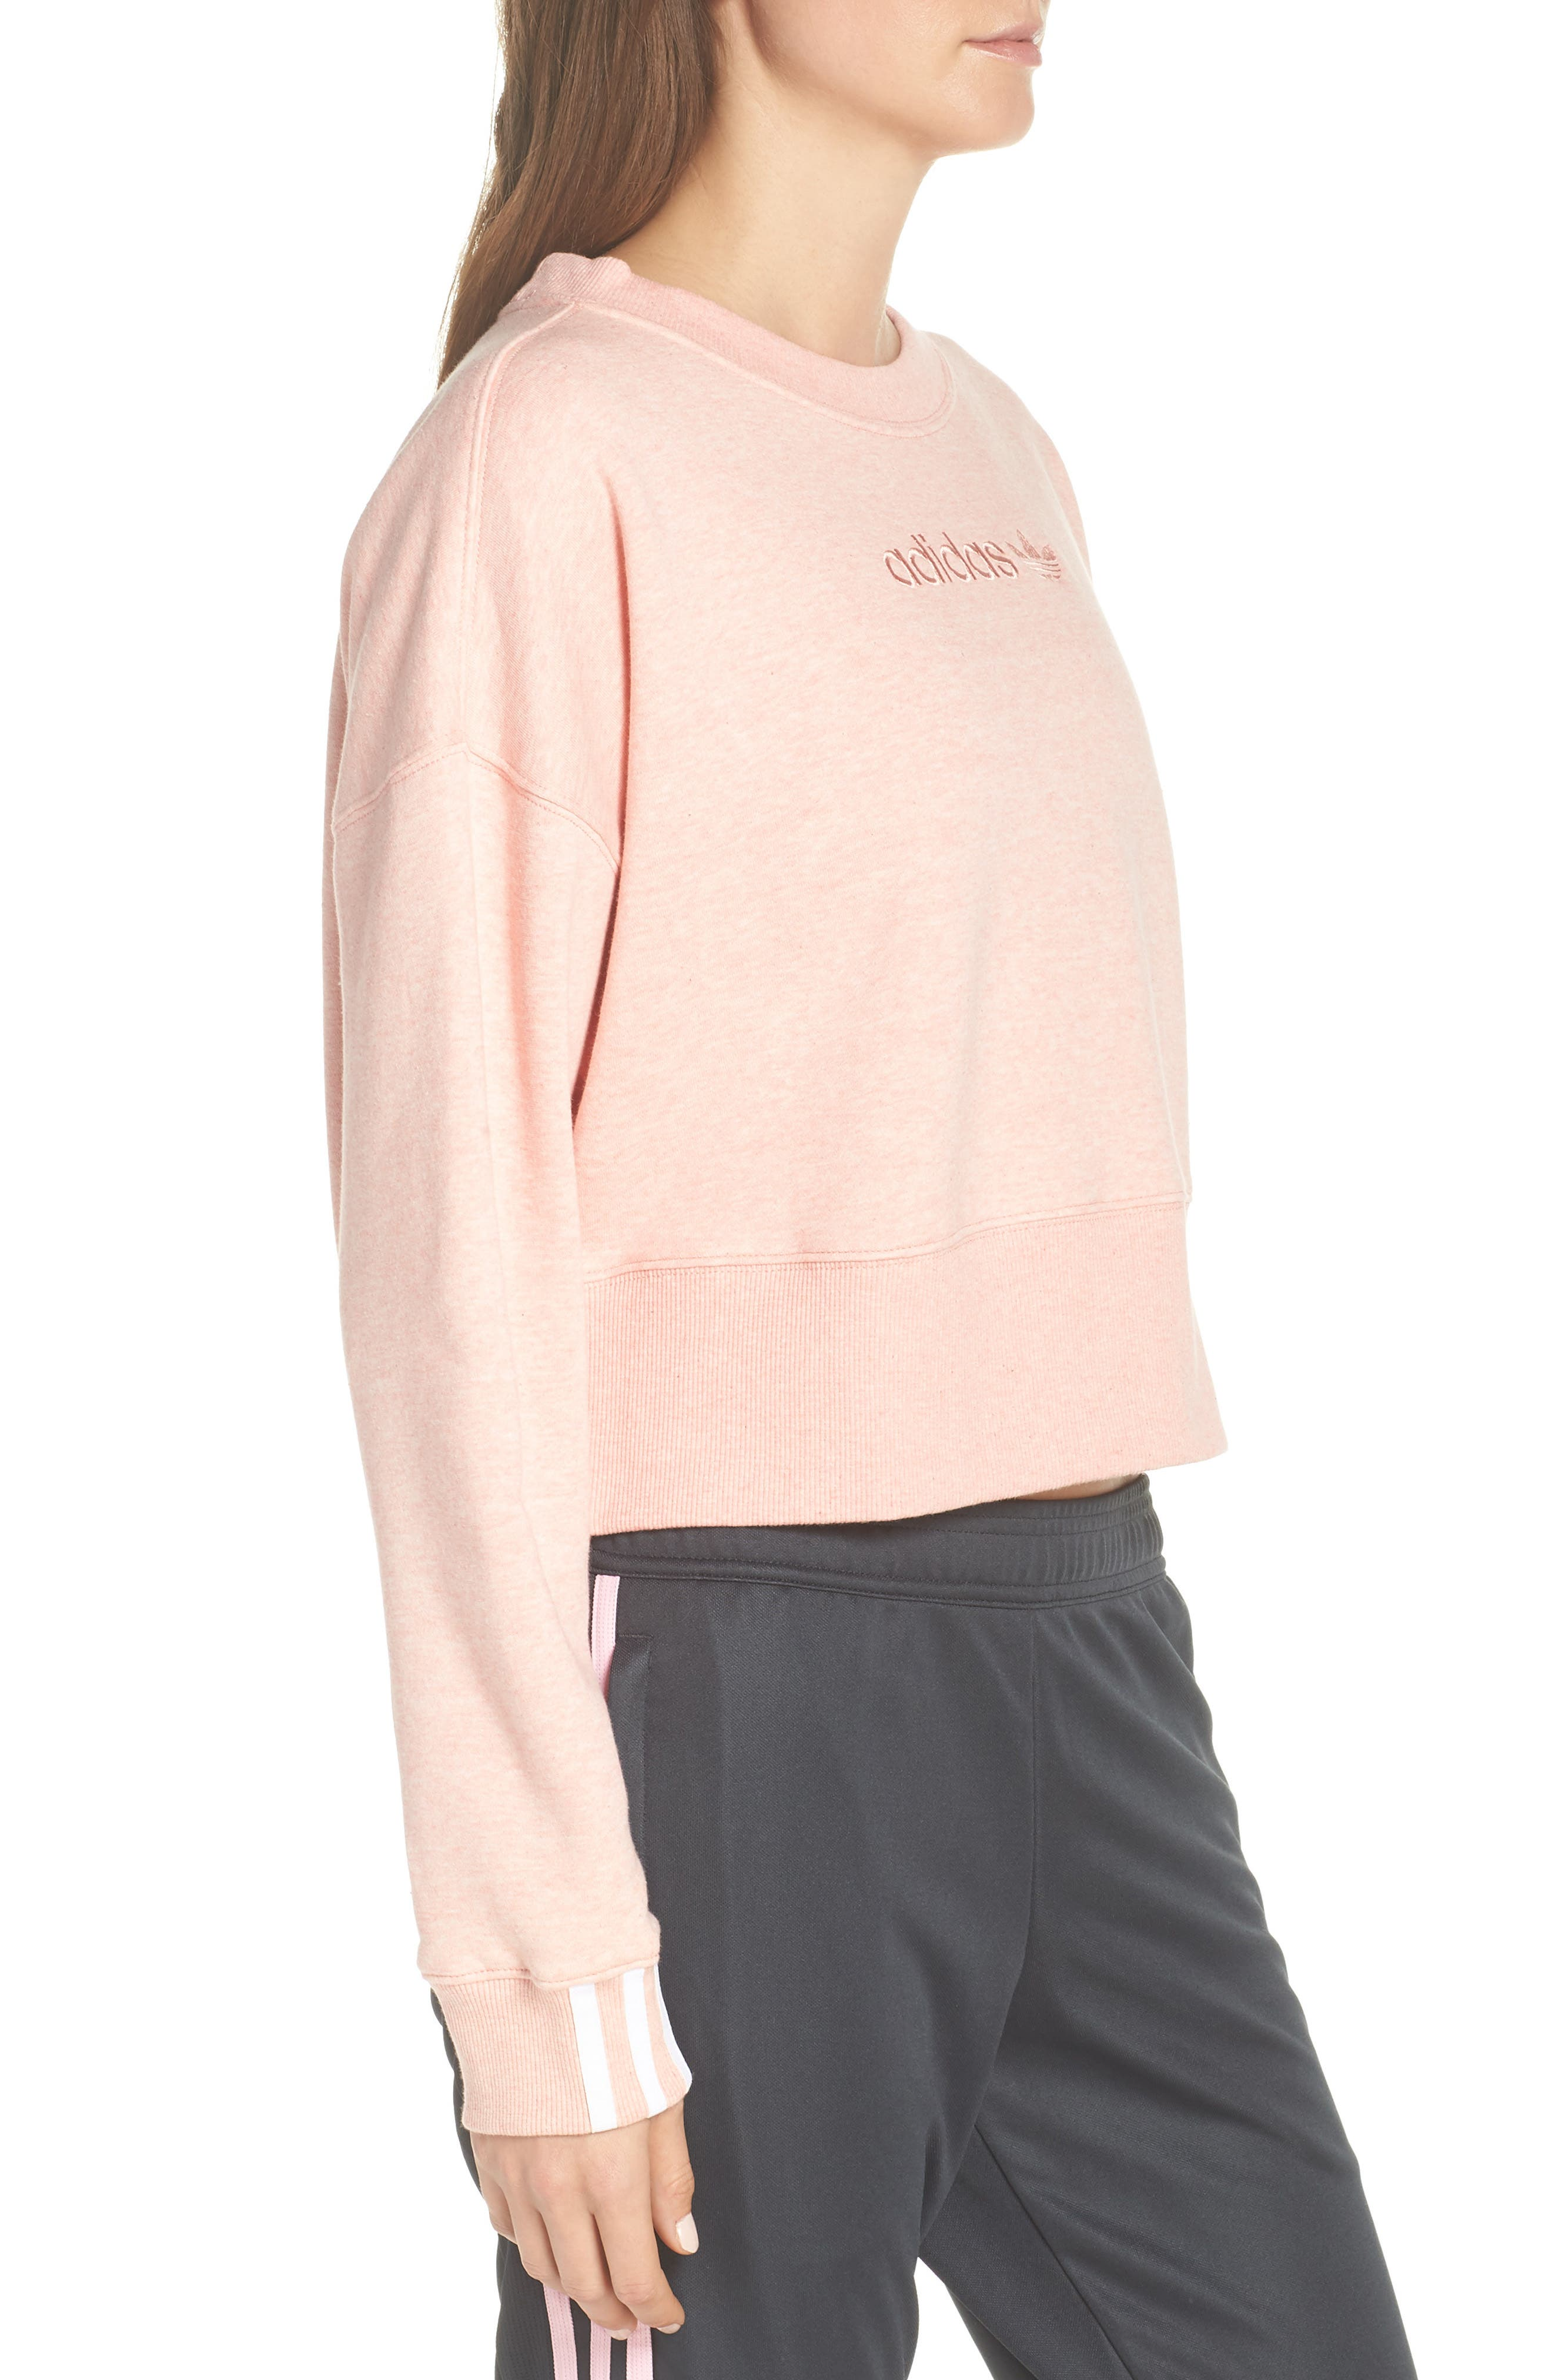 ADIDAS ORIGINALS, adidas Coeeze Crop Sweatshirt, Alternate thumbnail 4, color, 650